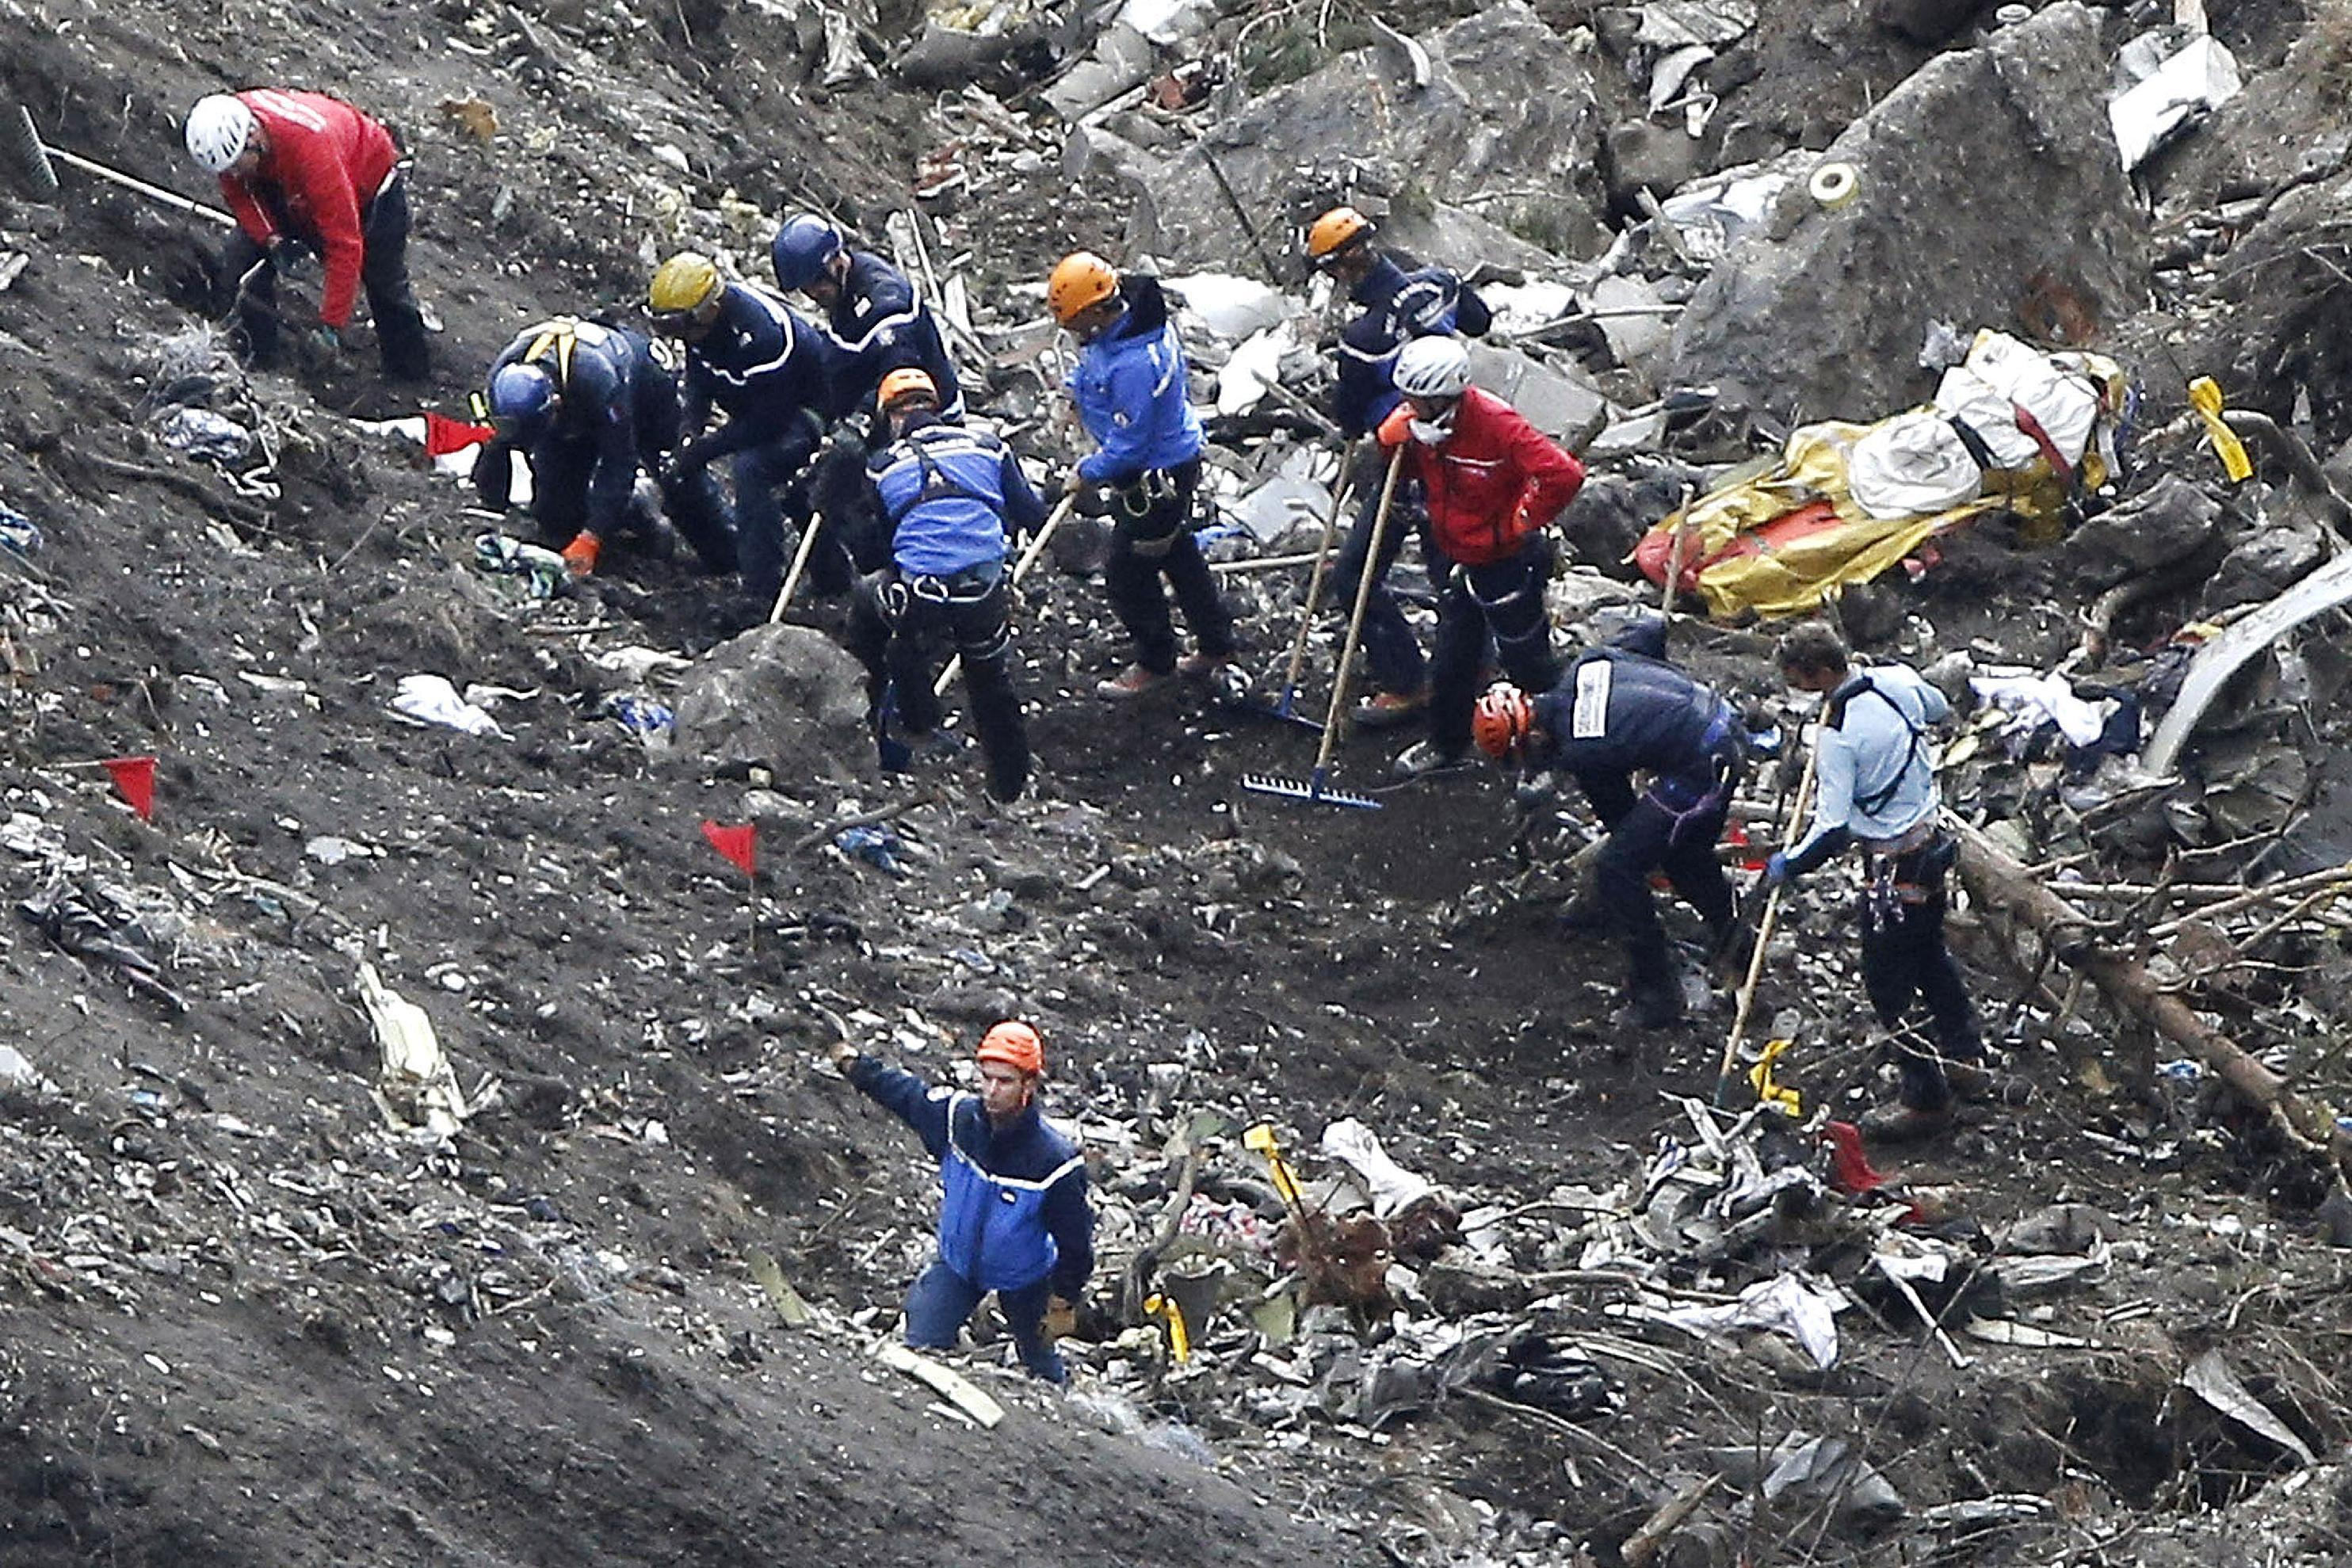 Report: Germanwings crash co-pilot tried descent previously